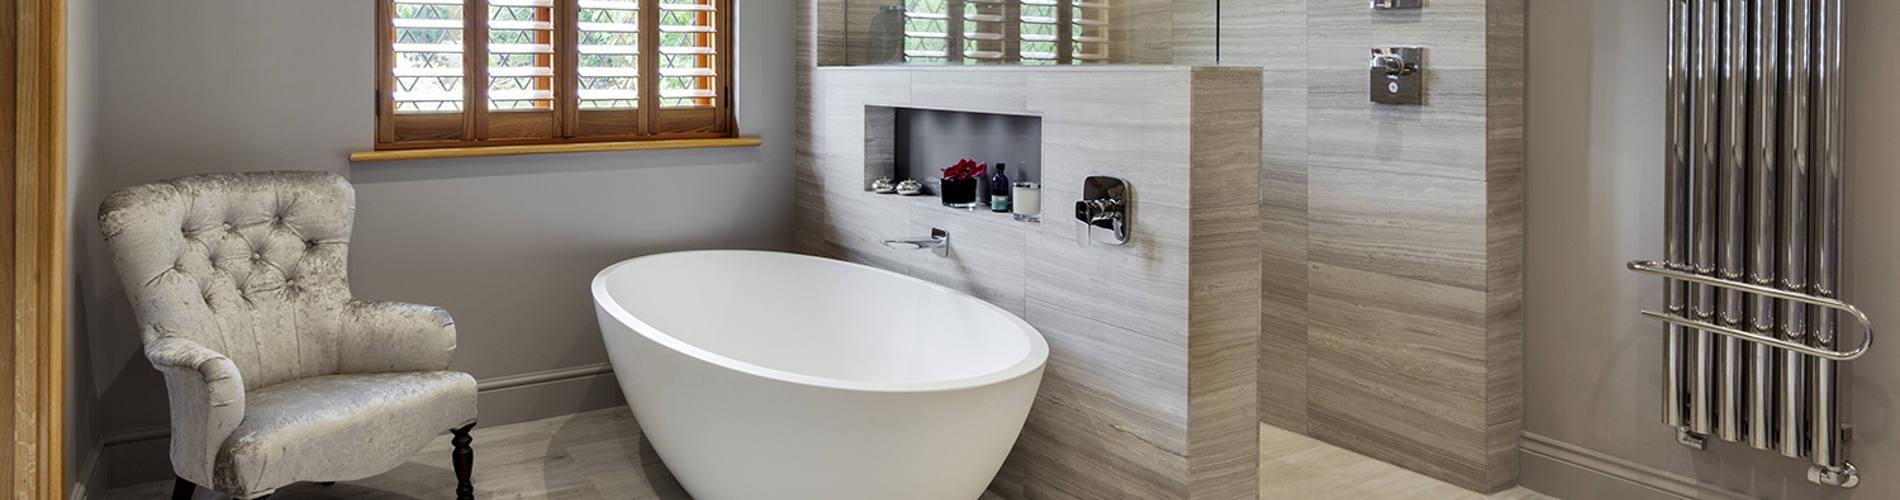 Bathroom Design And Installation Horsham The Brighton Bathroom Company